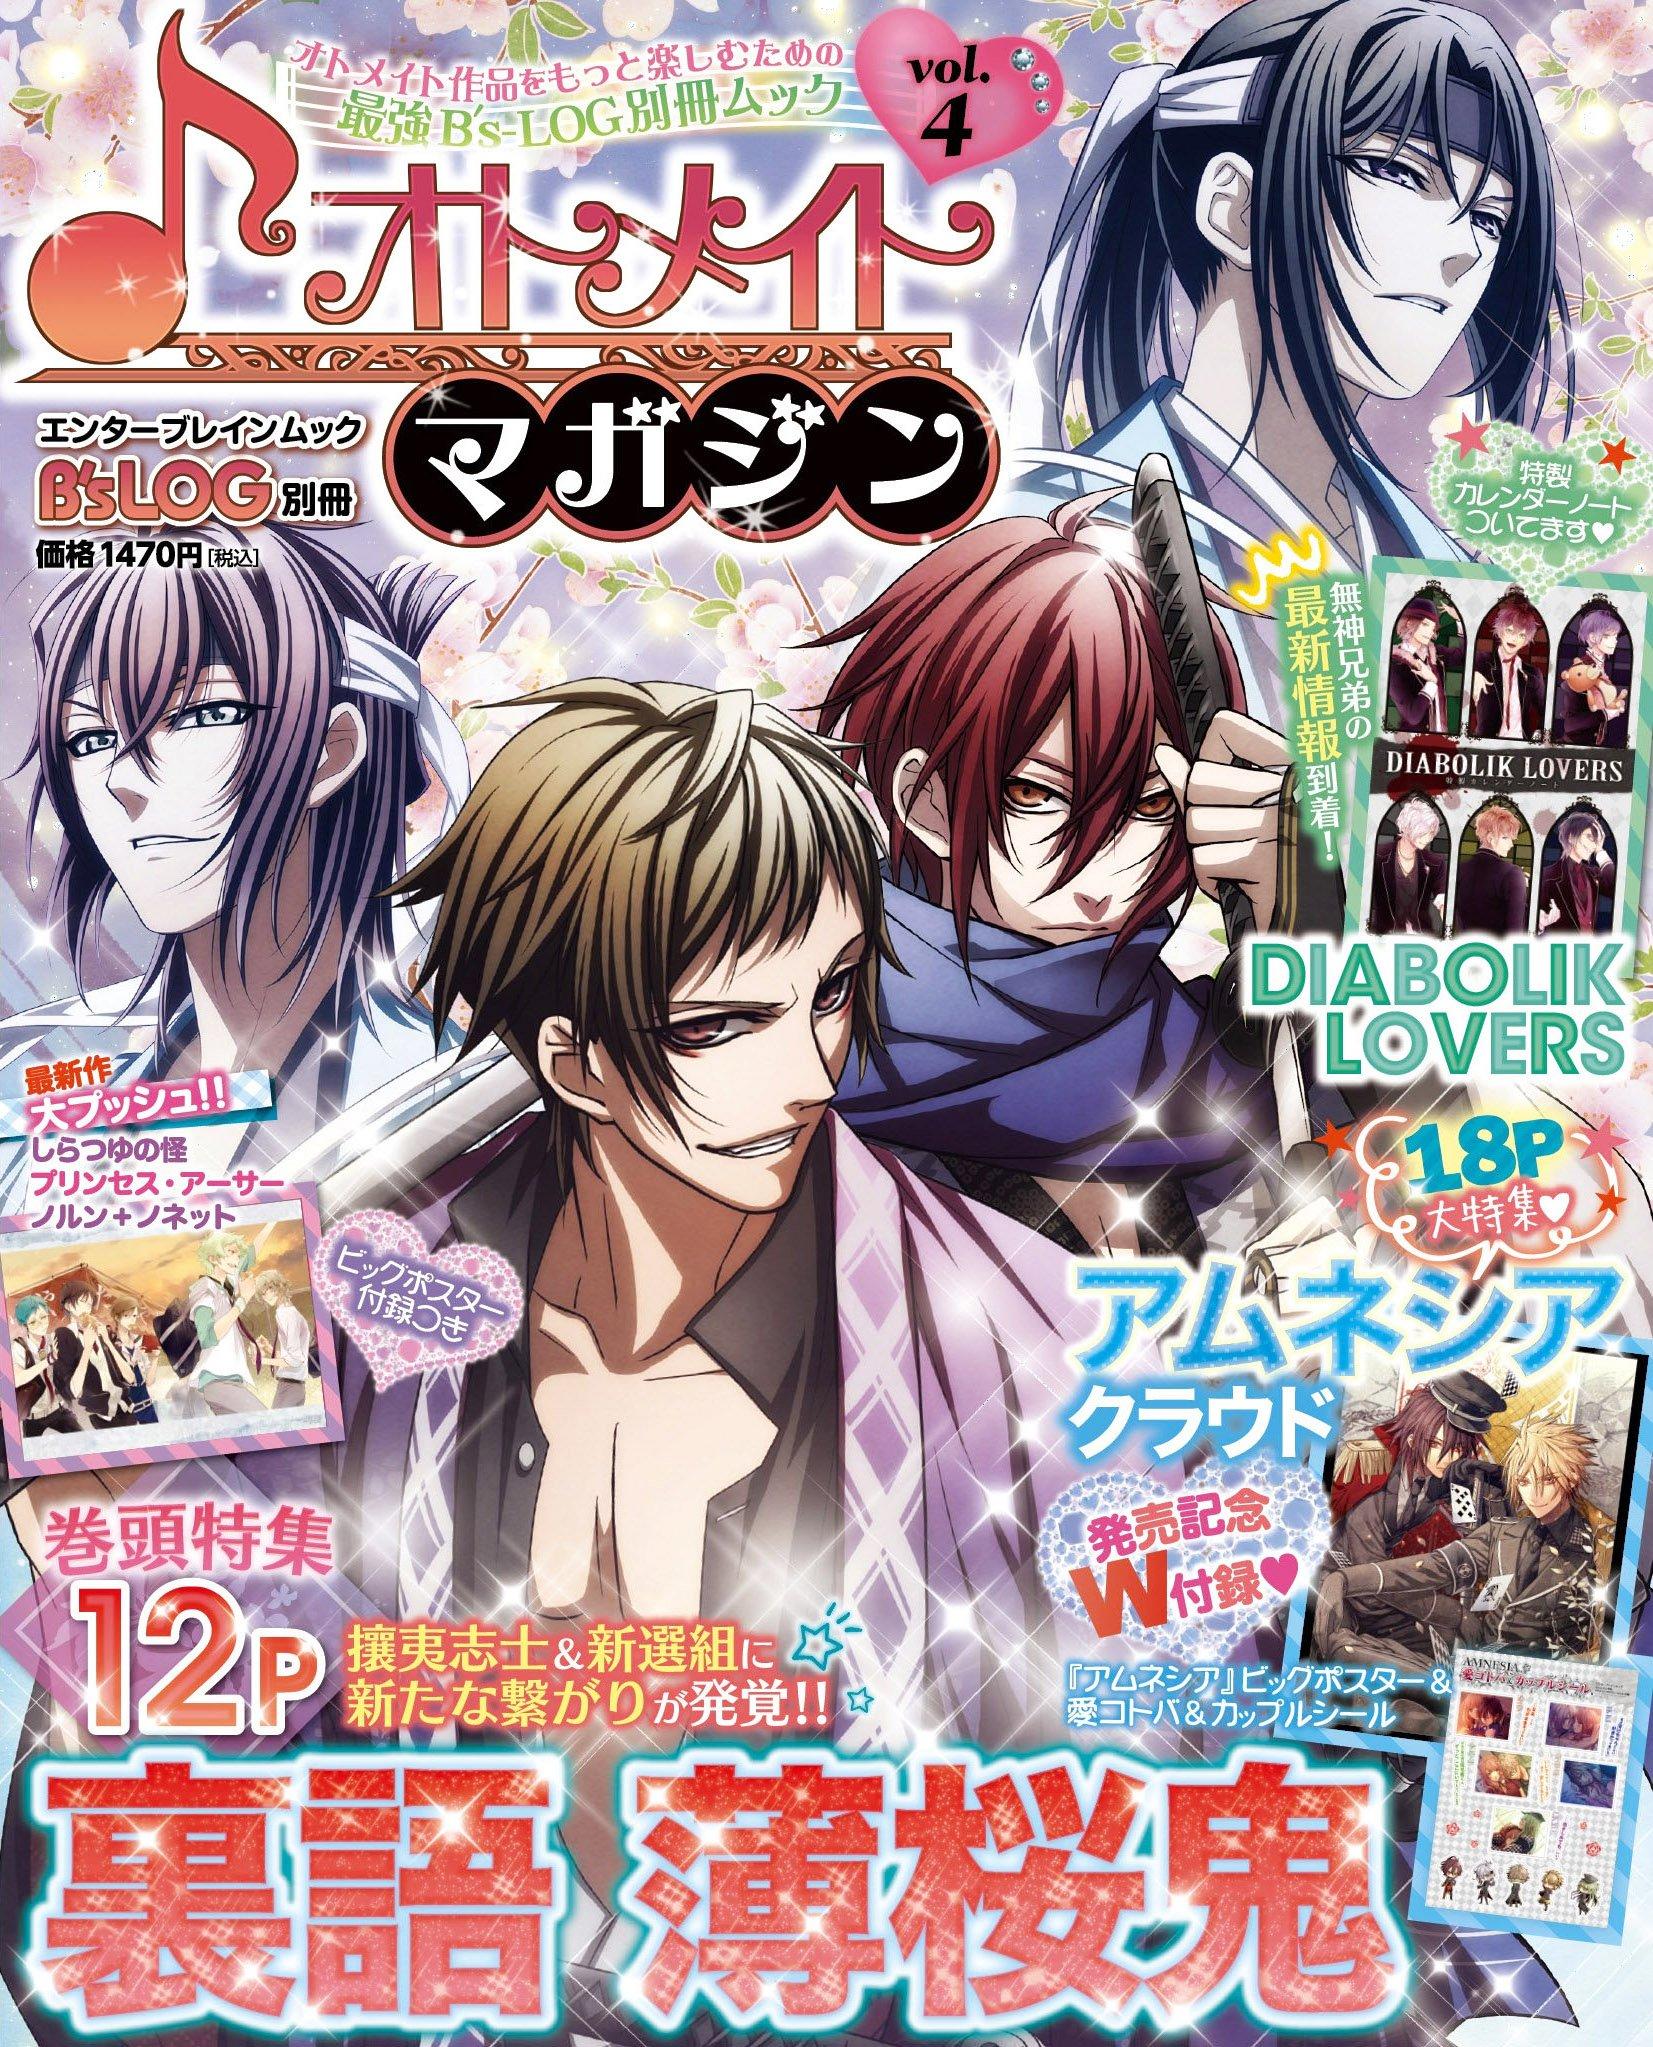 B's-LOG - Otomate Magazine Vol.04 (April 2013)